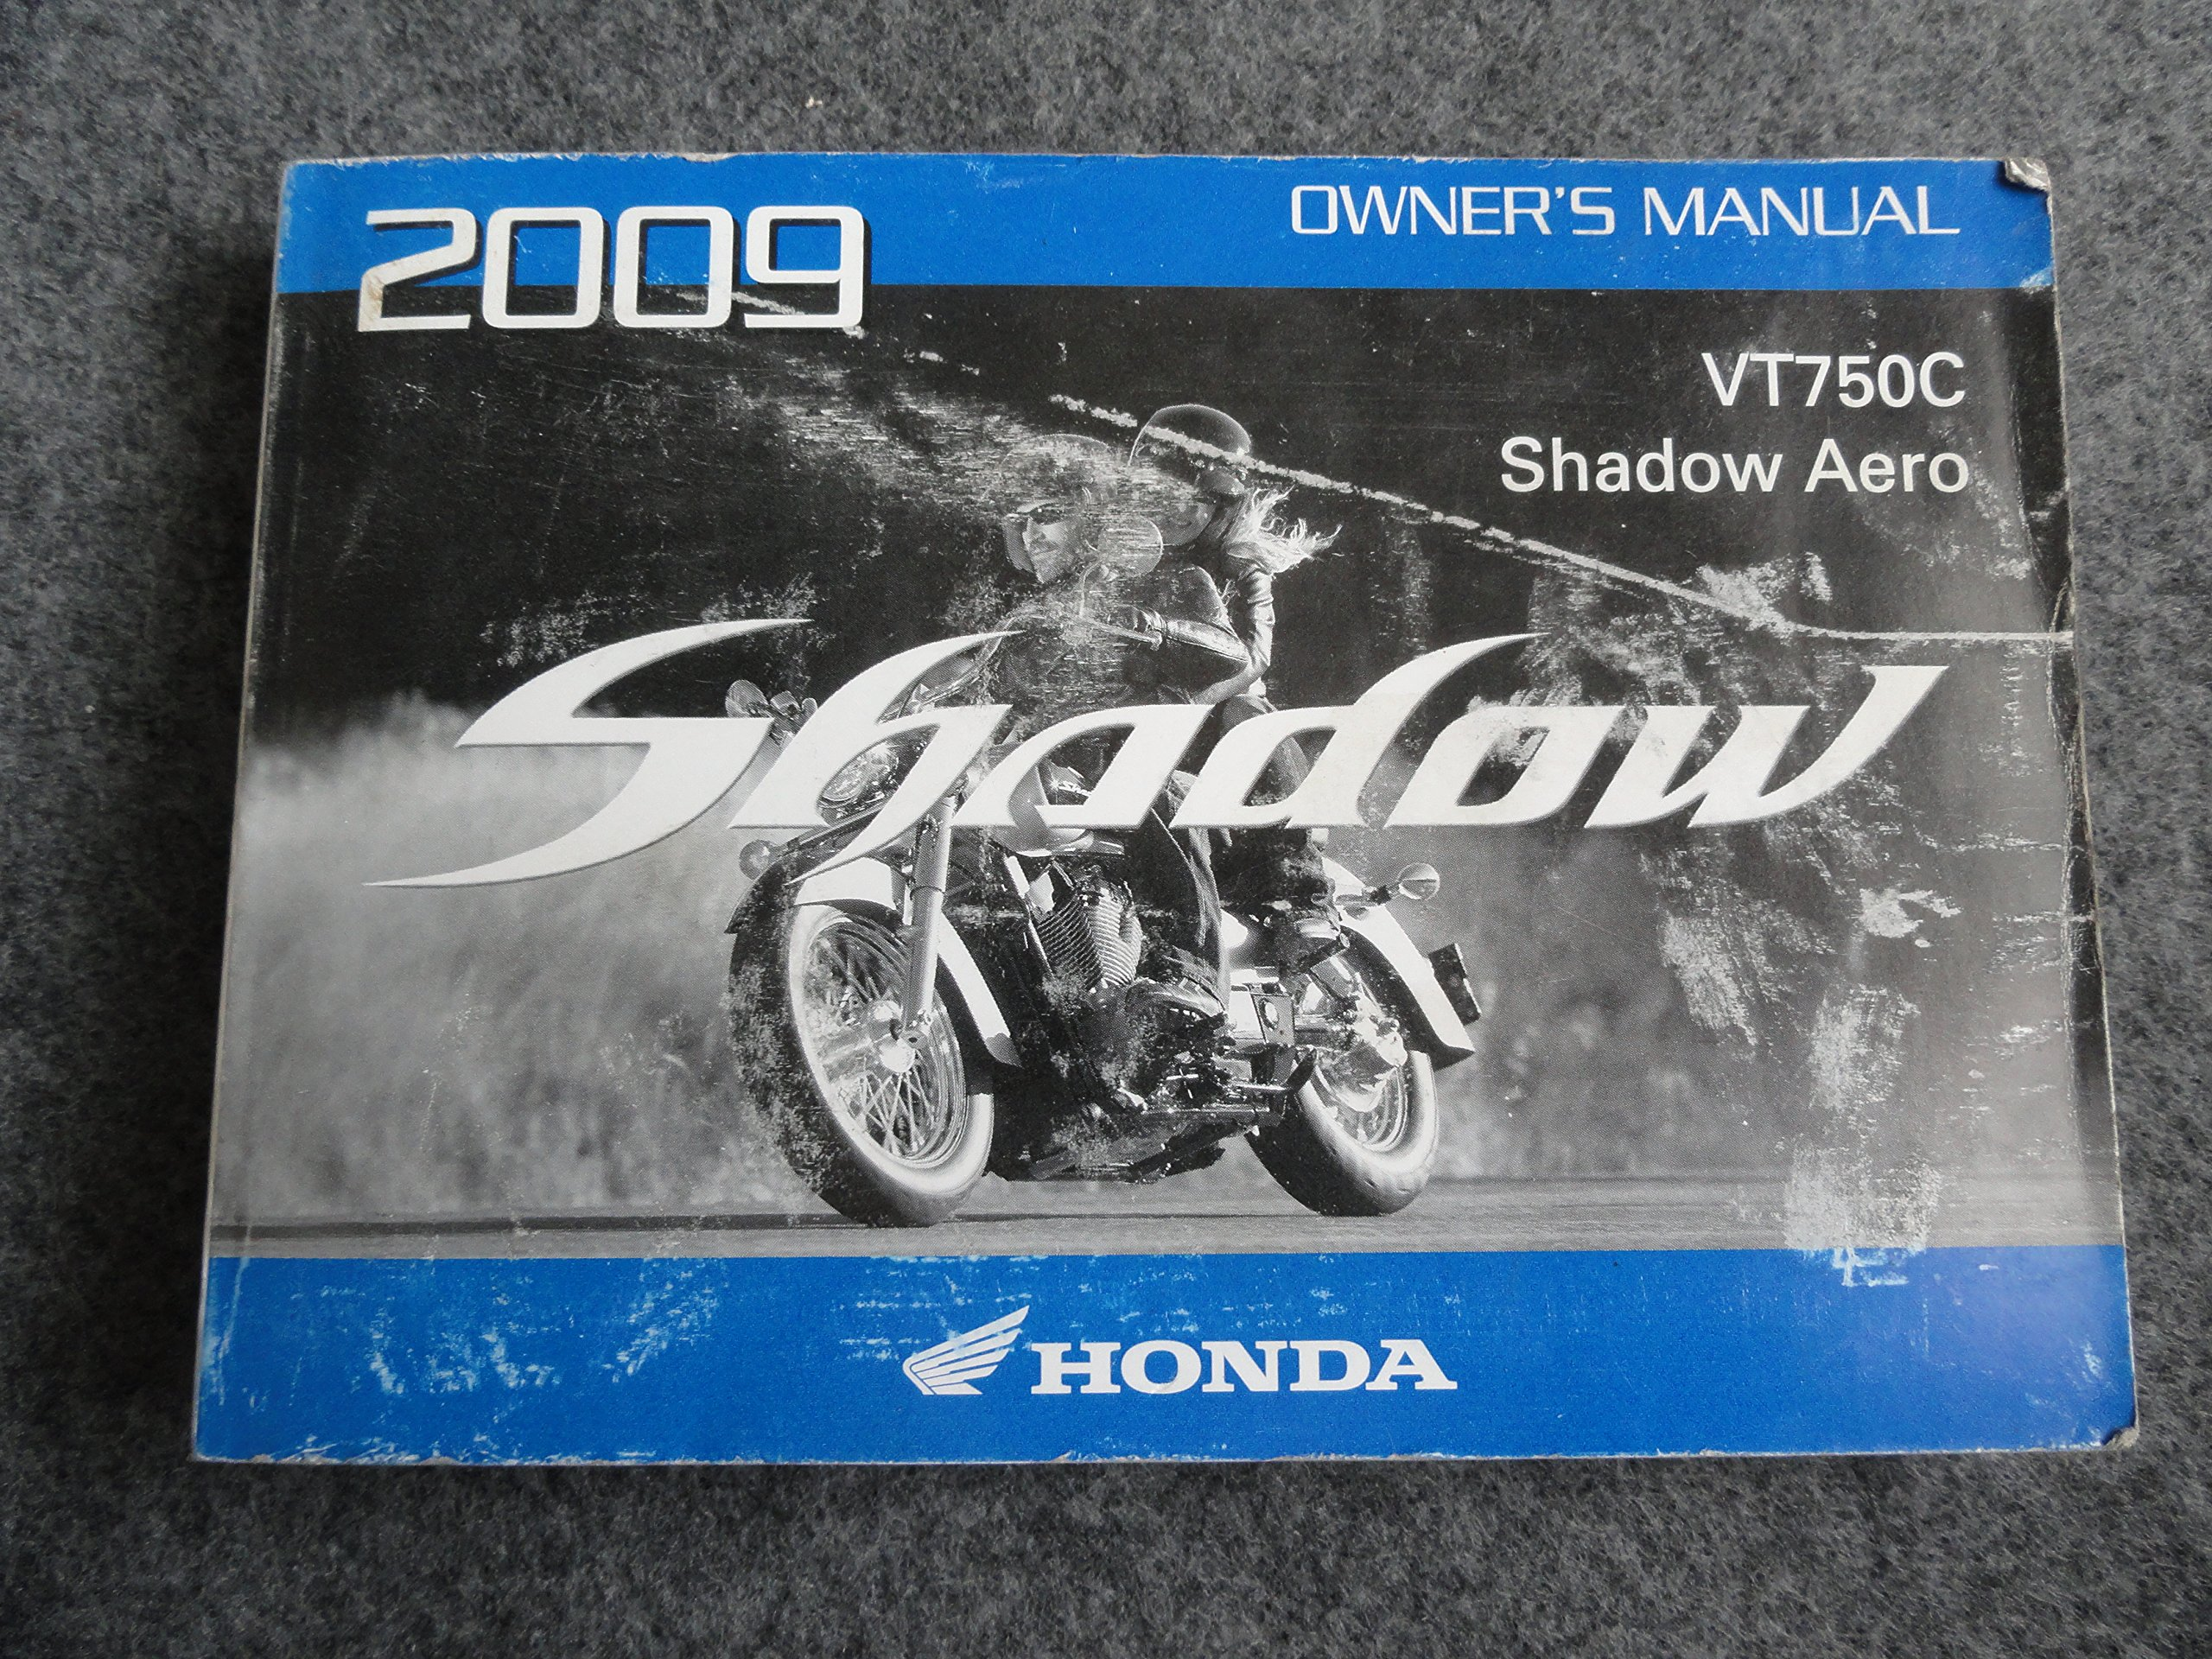 2009 Honda VT750 Owners Manual VT 750 C Shadow Aero: Honda: Amazon.com:  Books